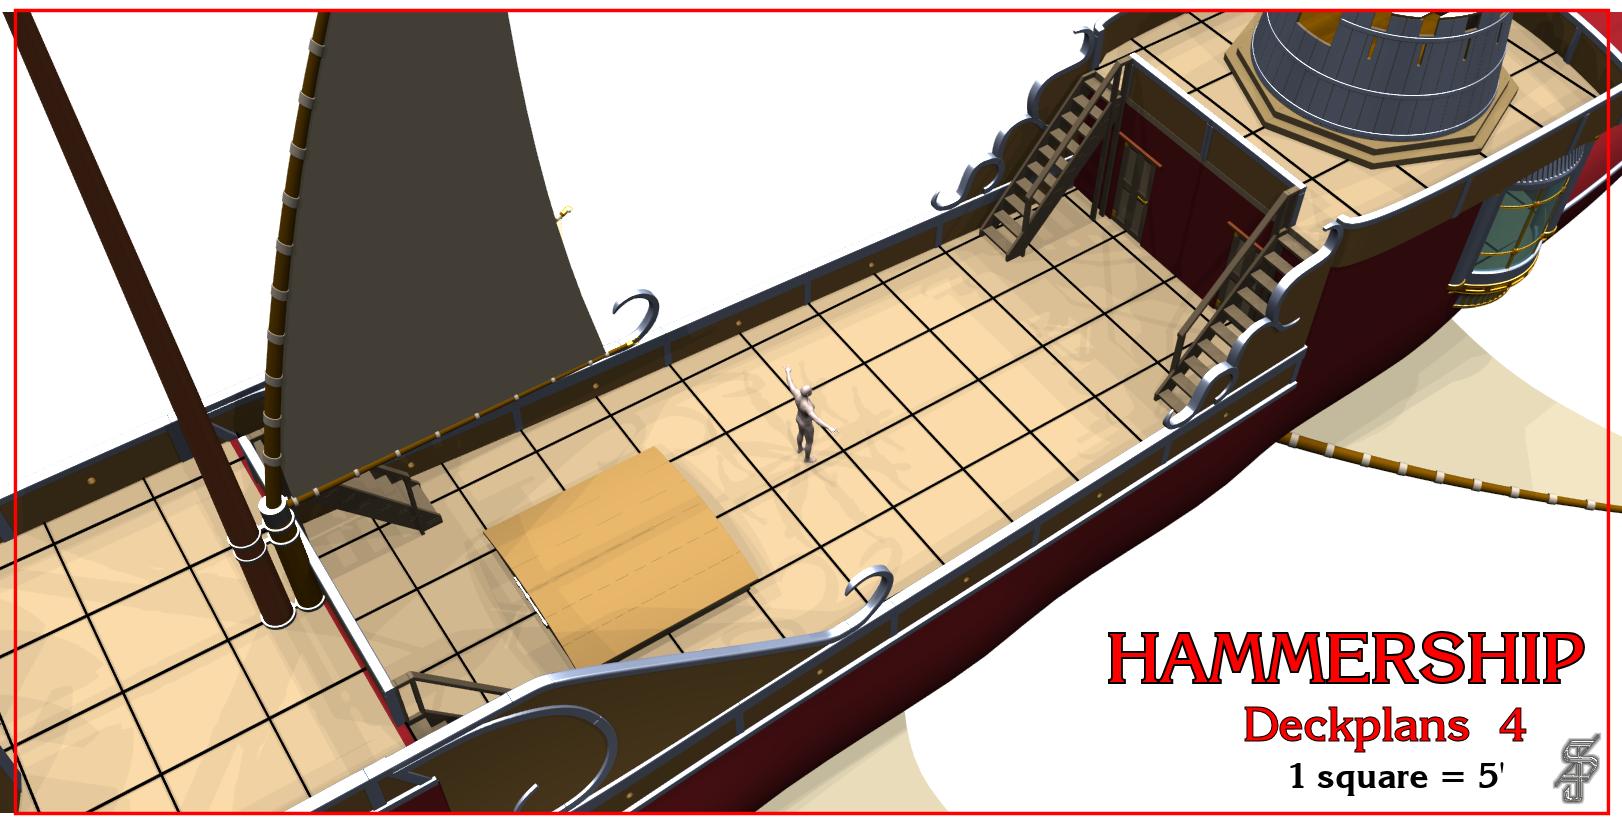 Hammership layout 4